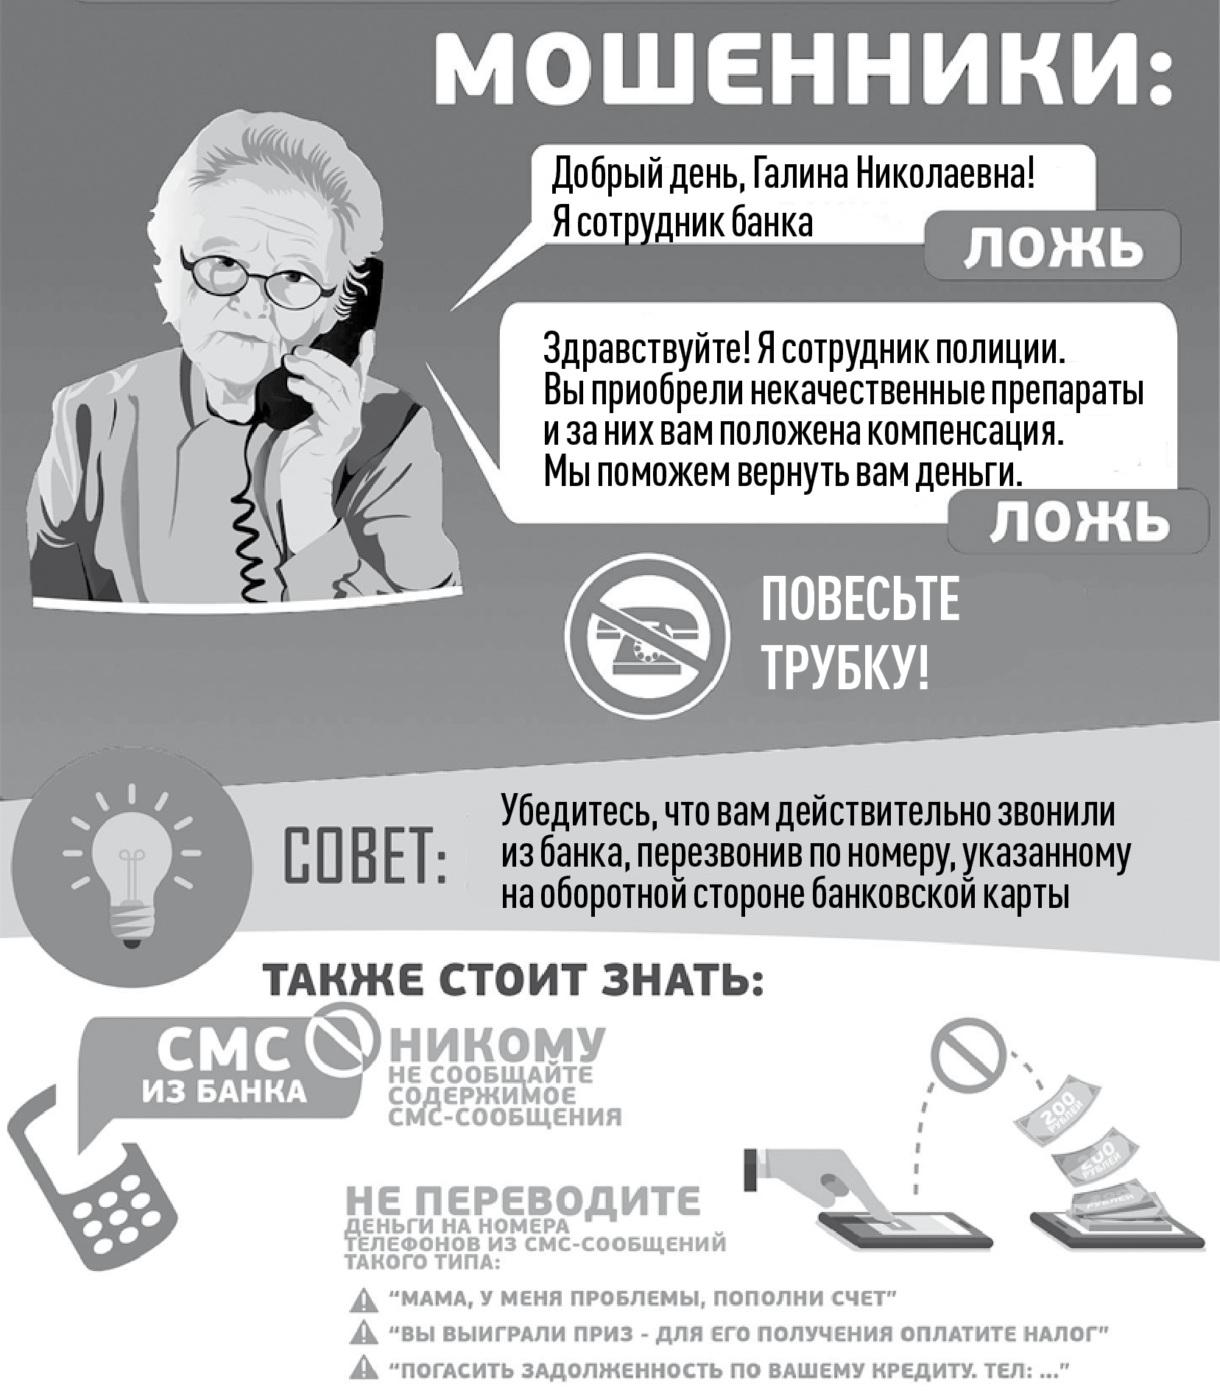 займ онлайн пенсионерам без прозвона